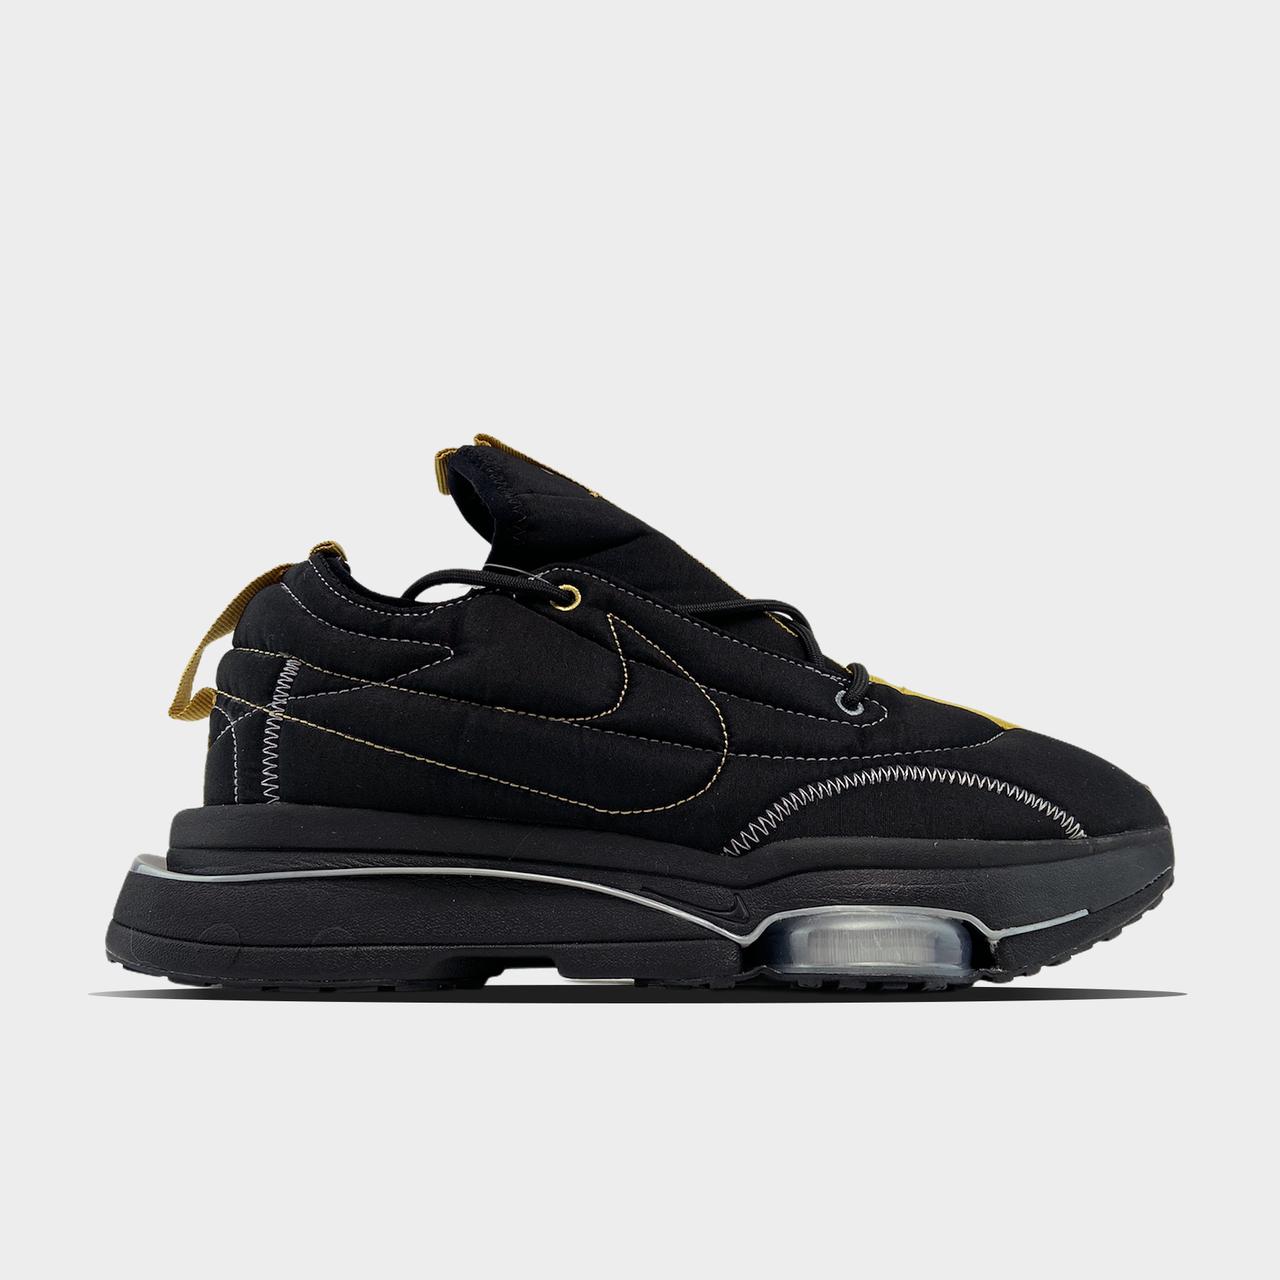 Nk, крос, обувь, взуття, sneakers, шузы, Air Zoom Type Black (Черный)